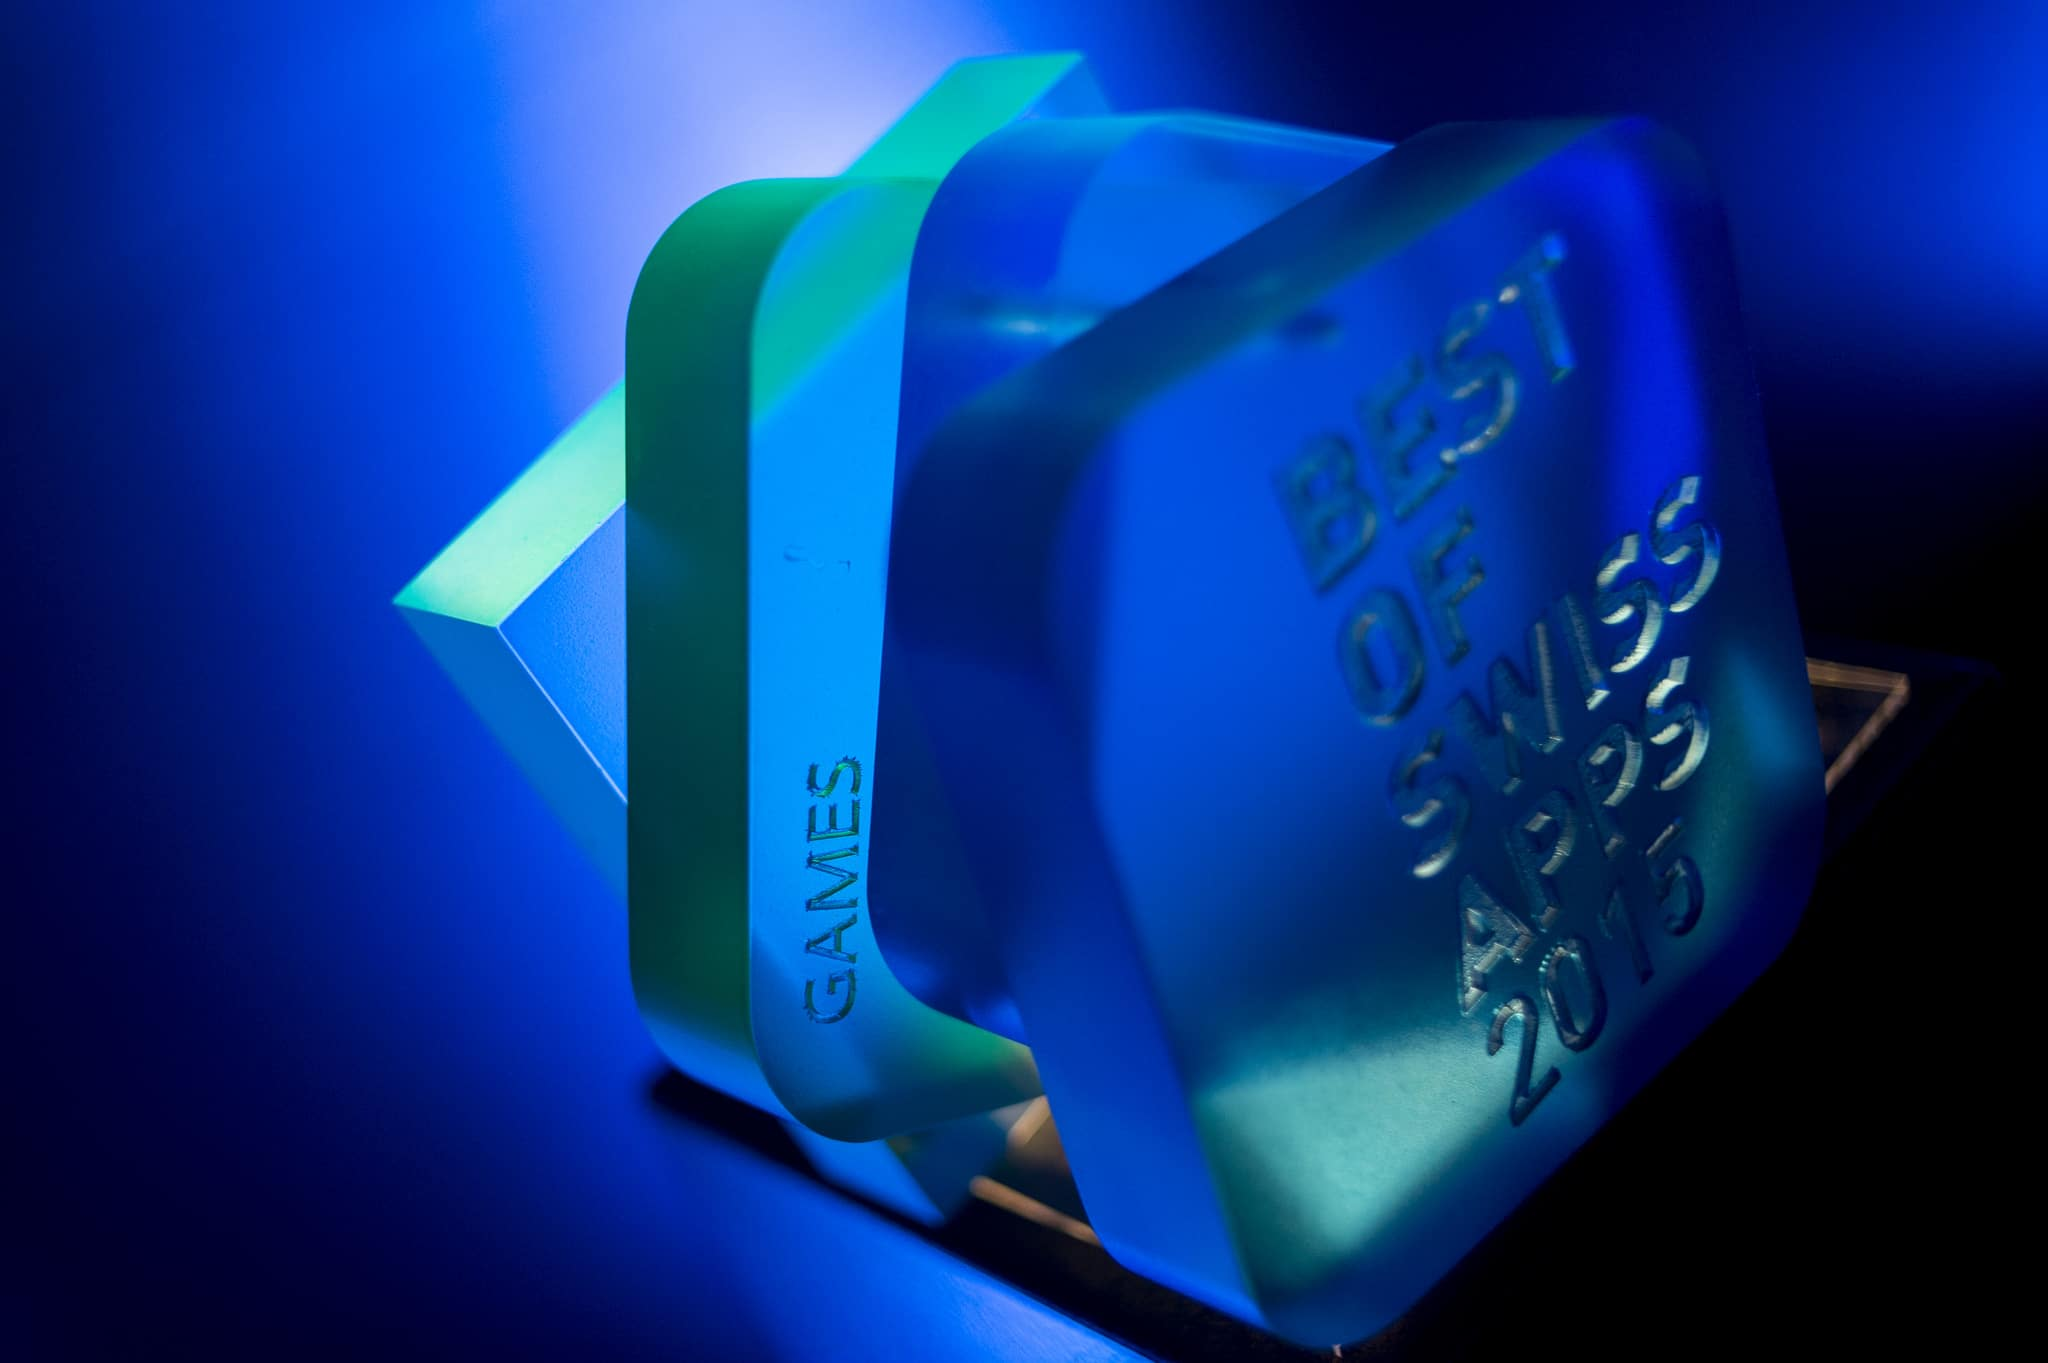 Best of Swiss Apps award medal